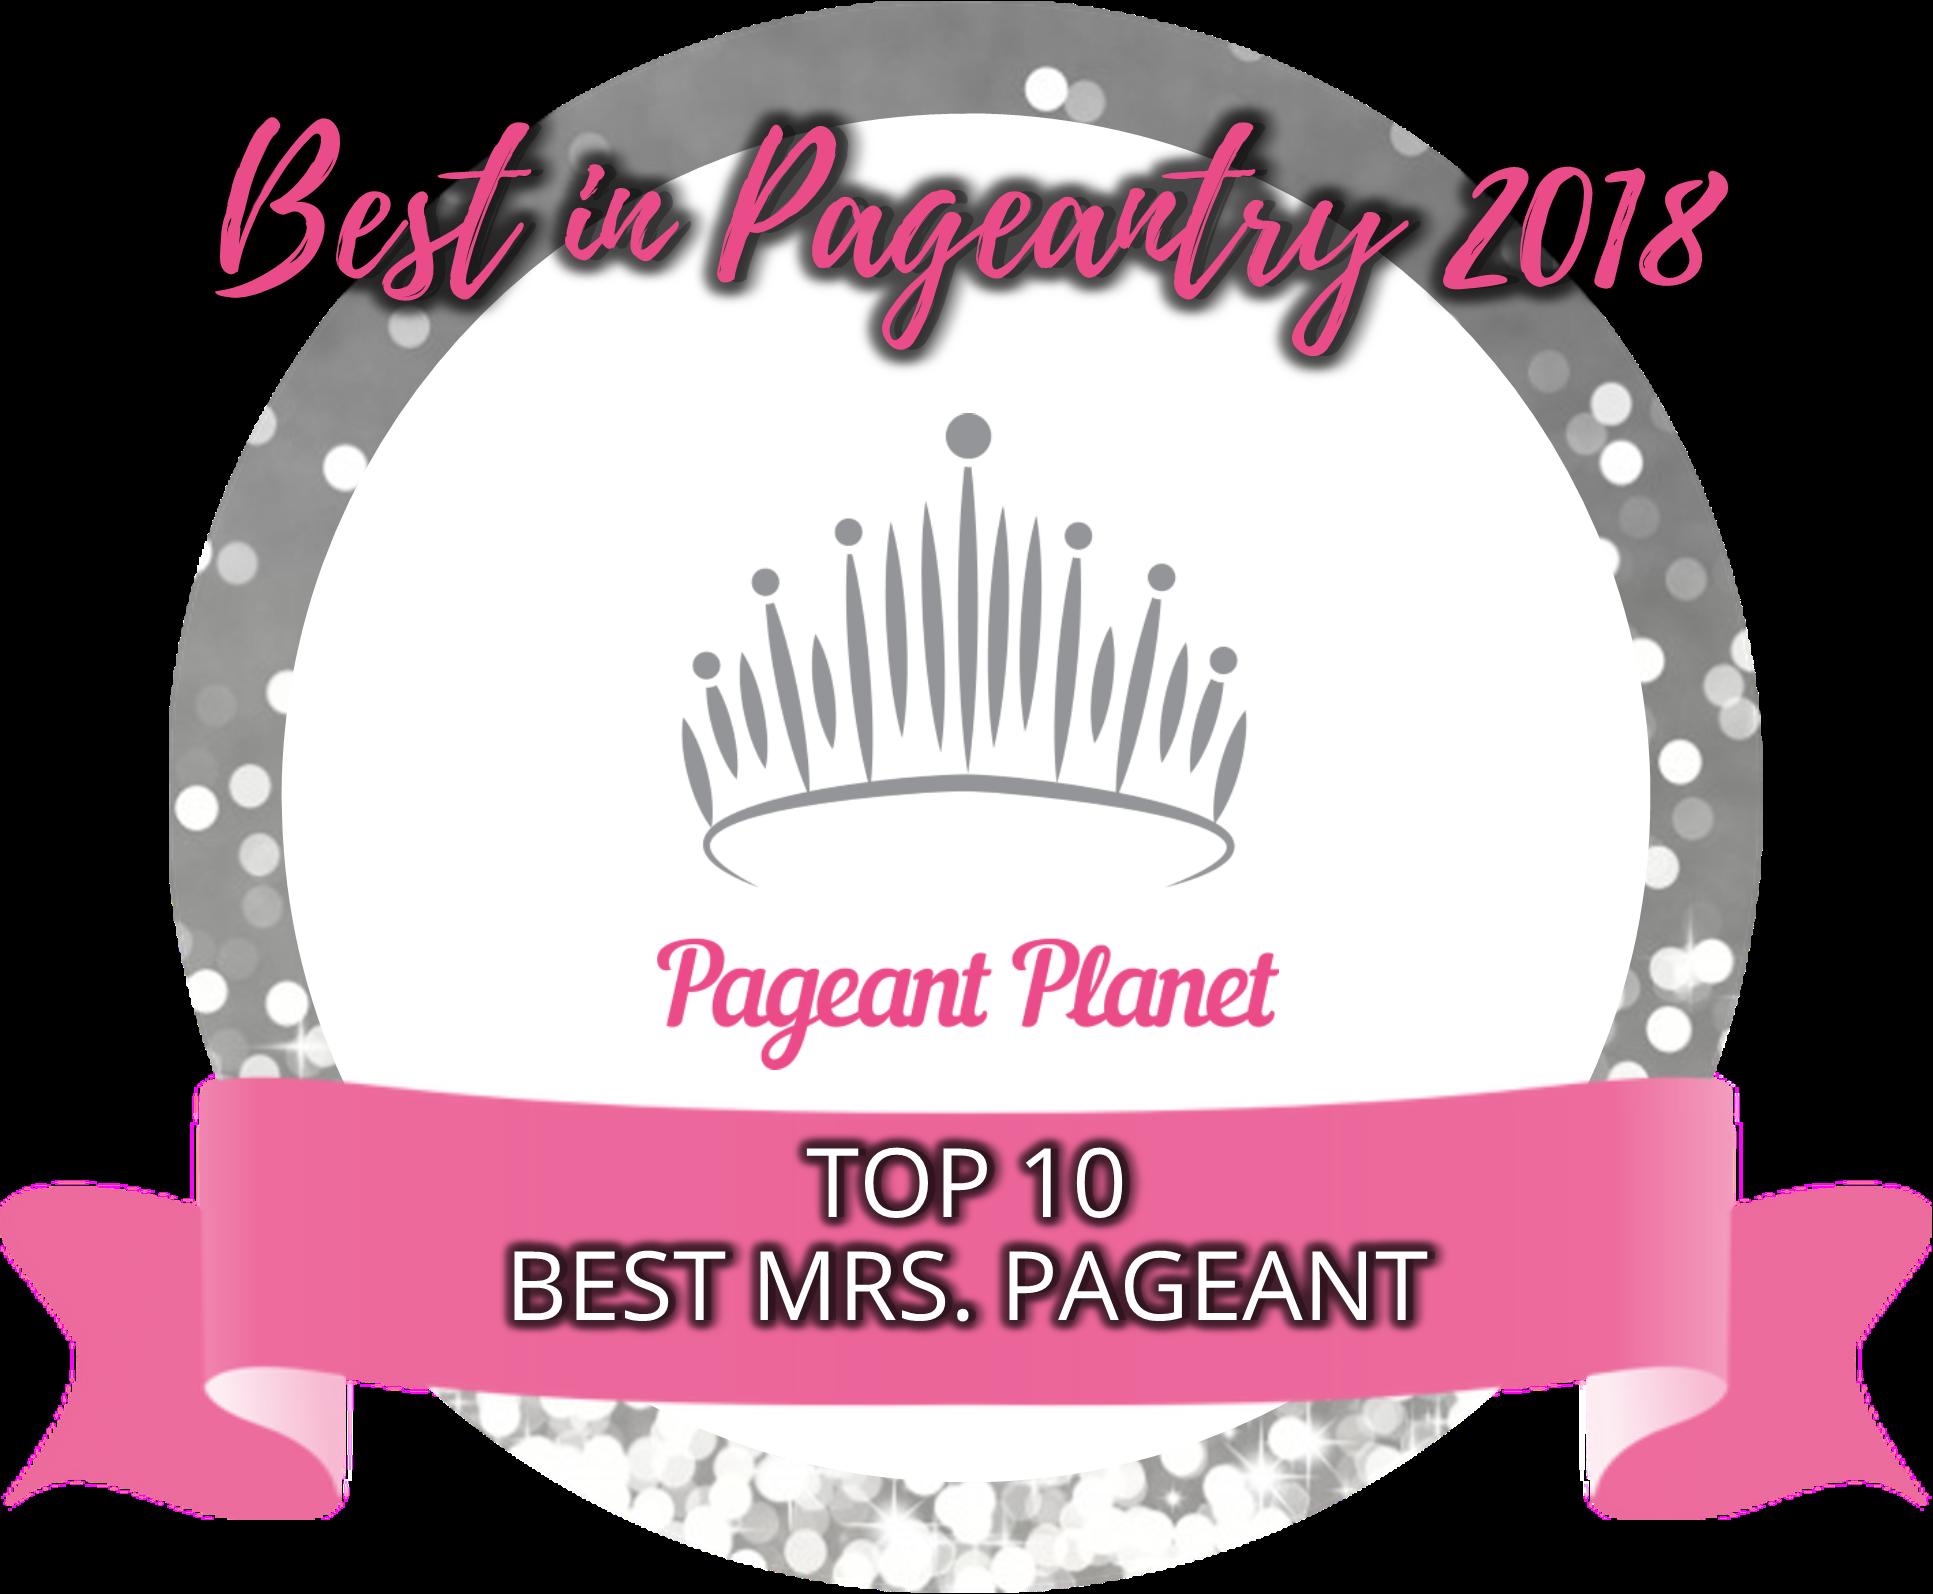 Top 10 Best Mrs. Pageants of 2018